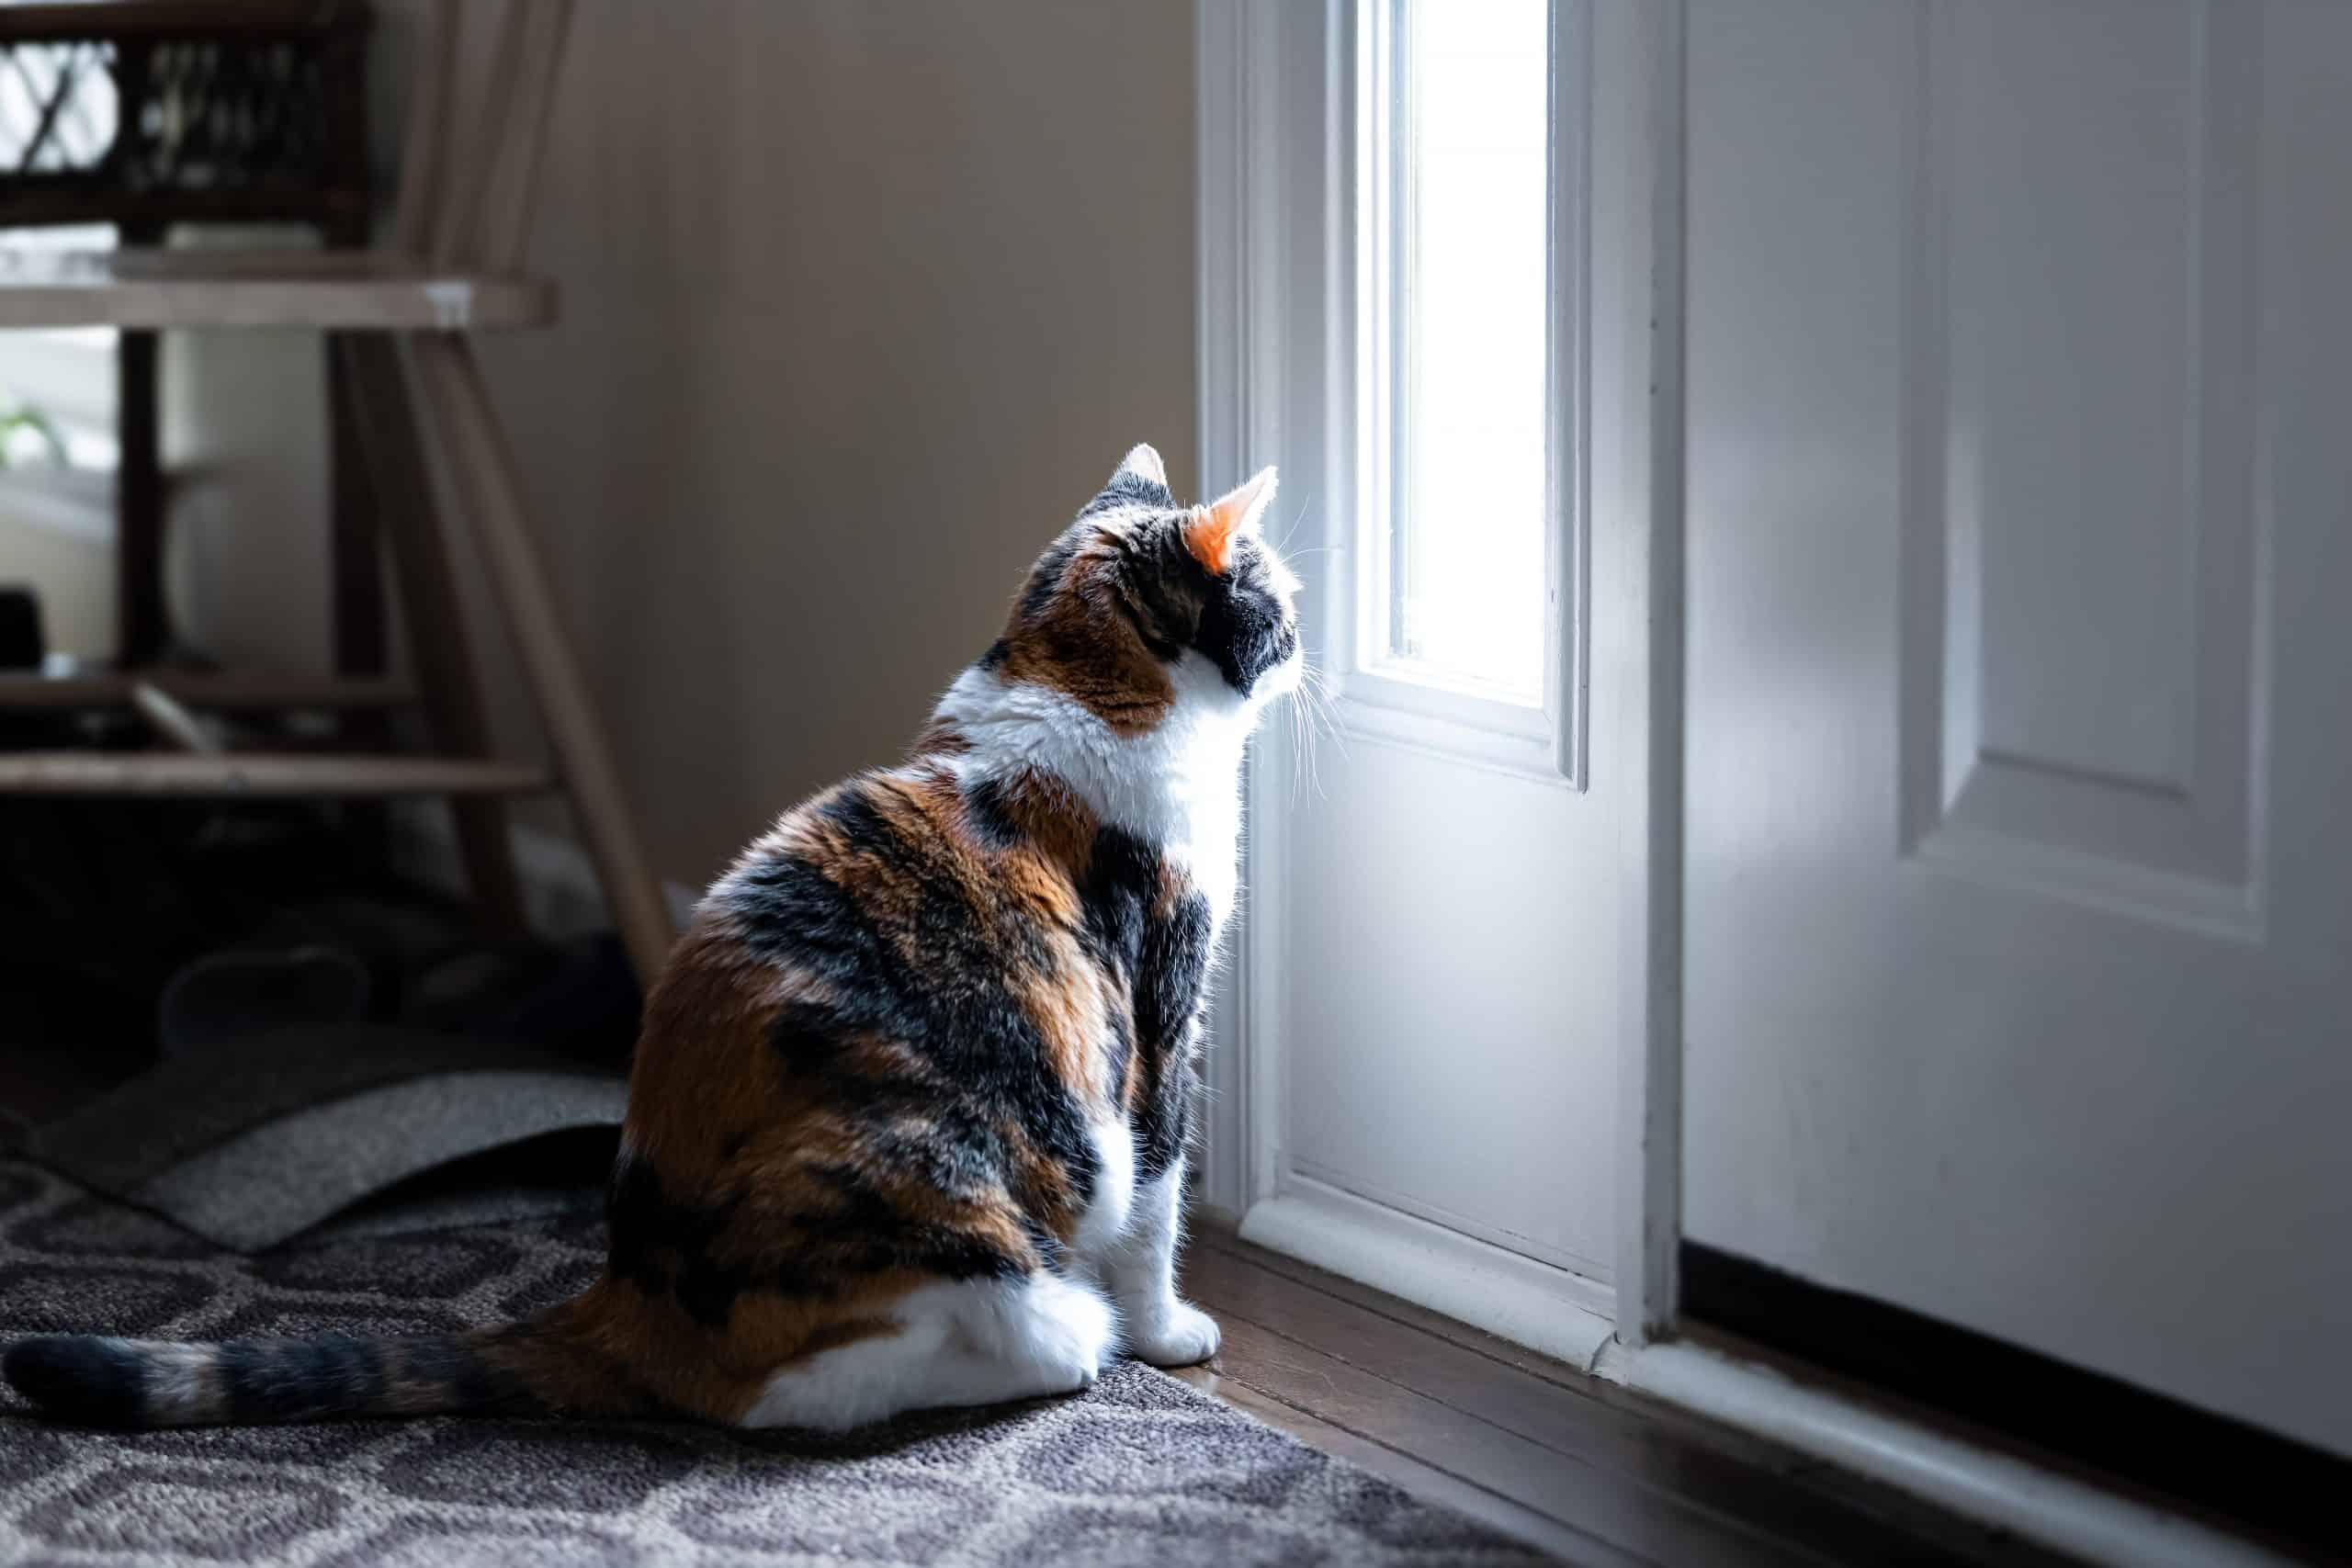 cats hate closed doors